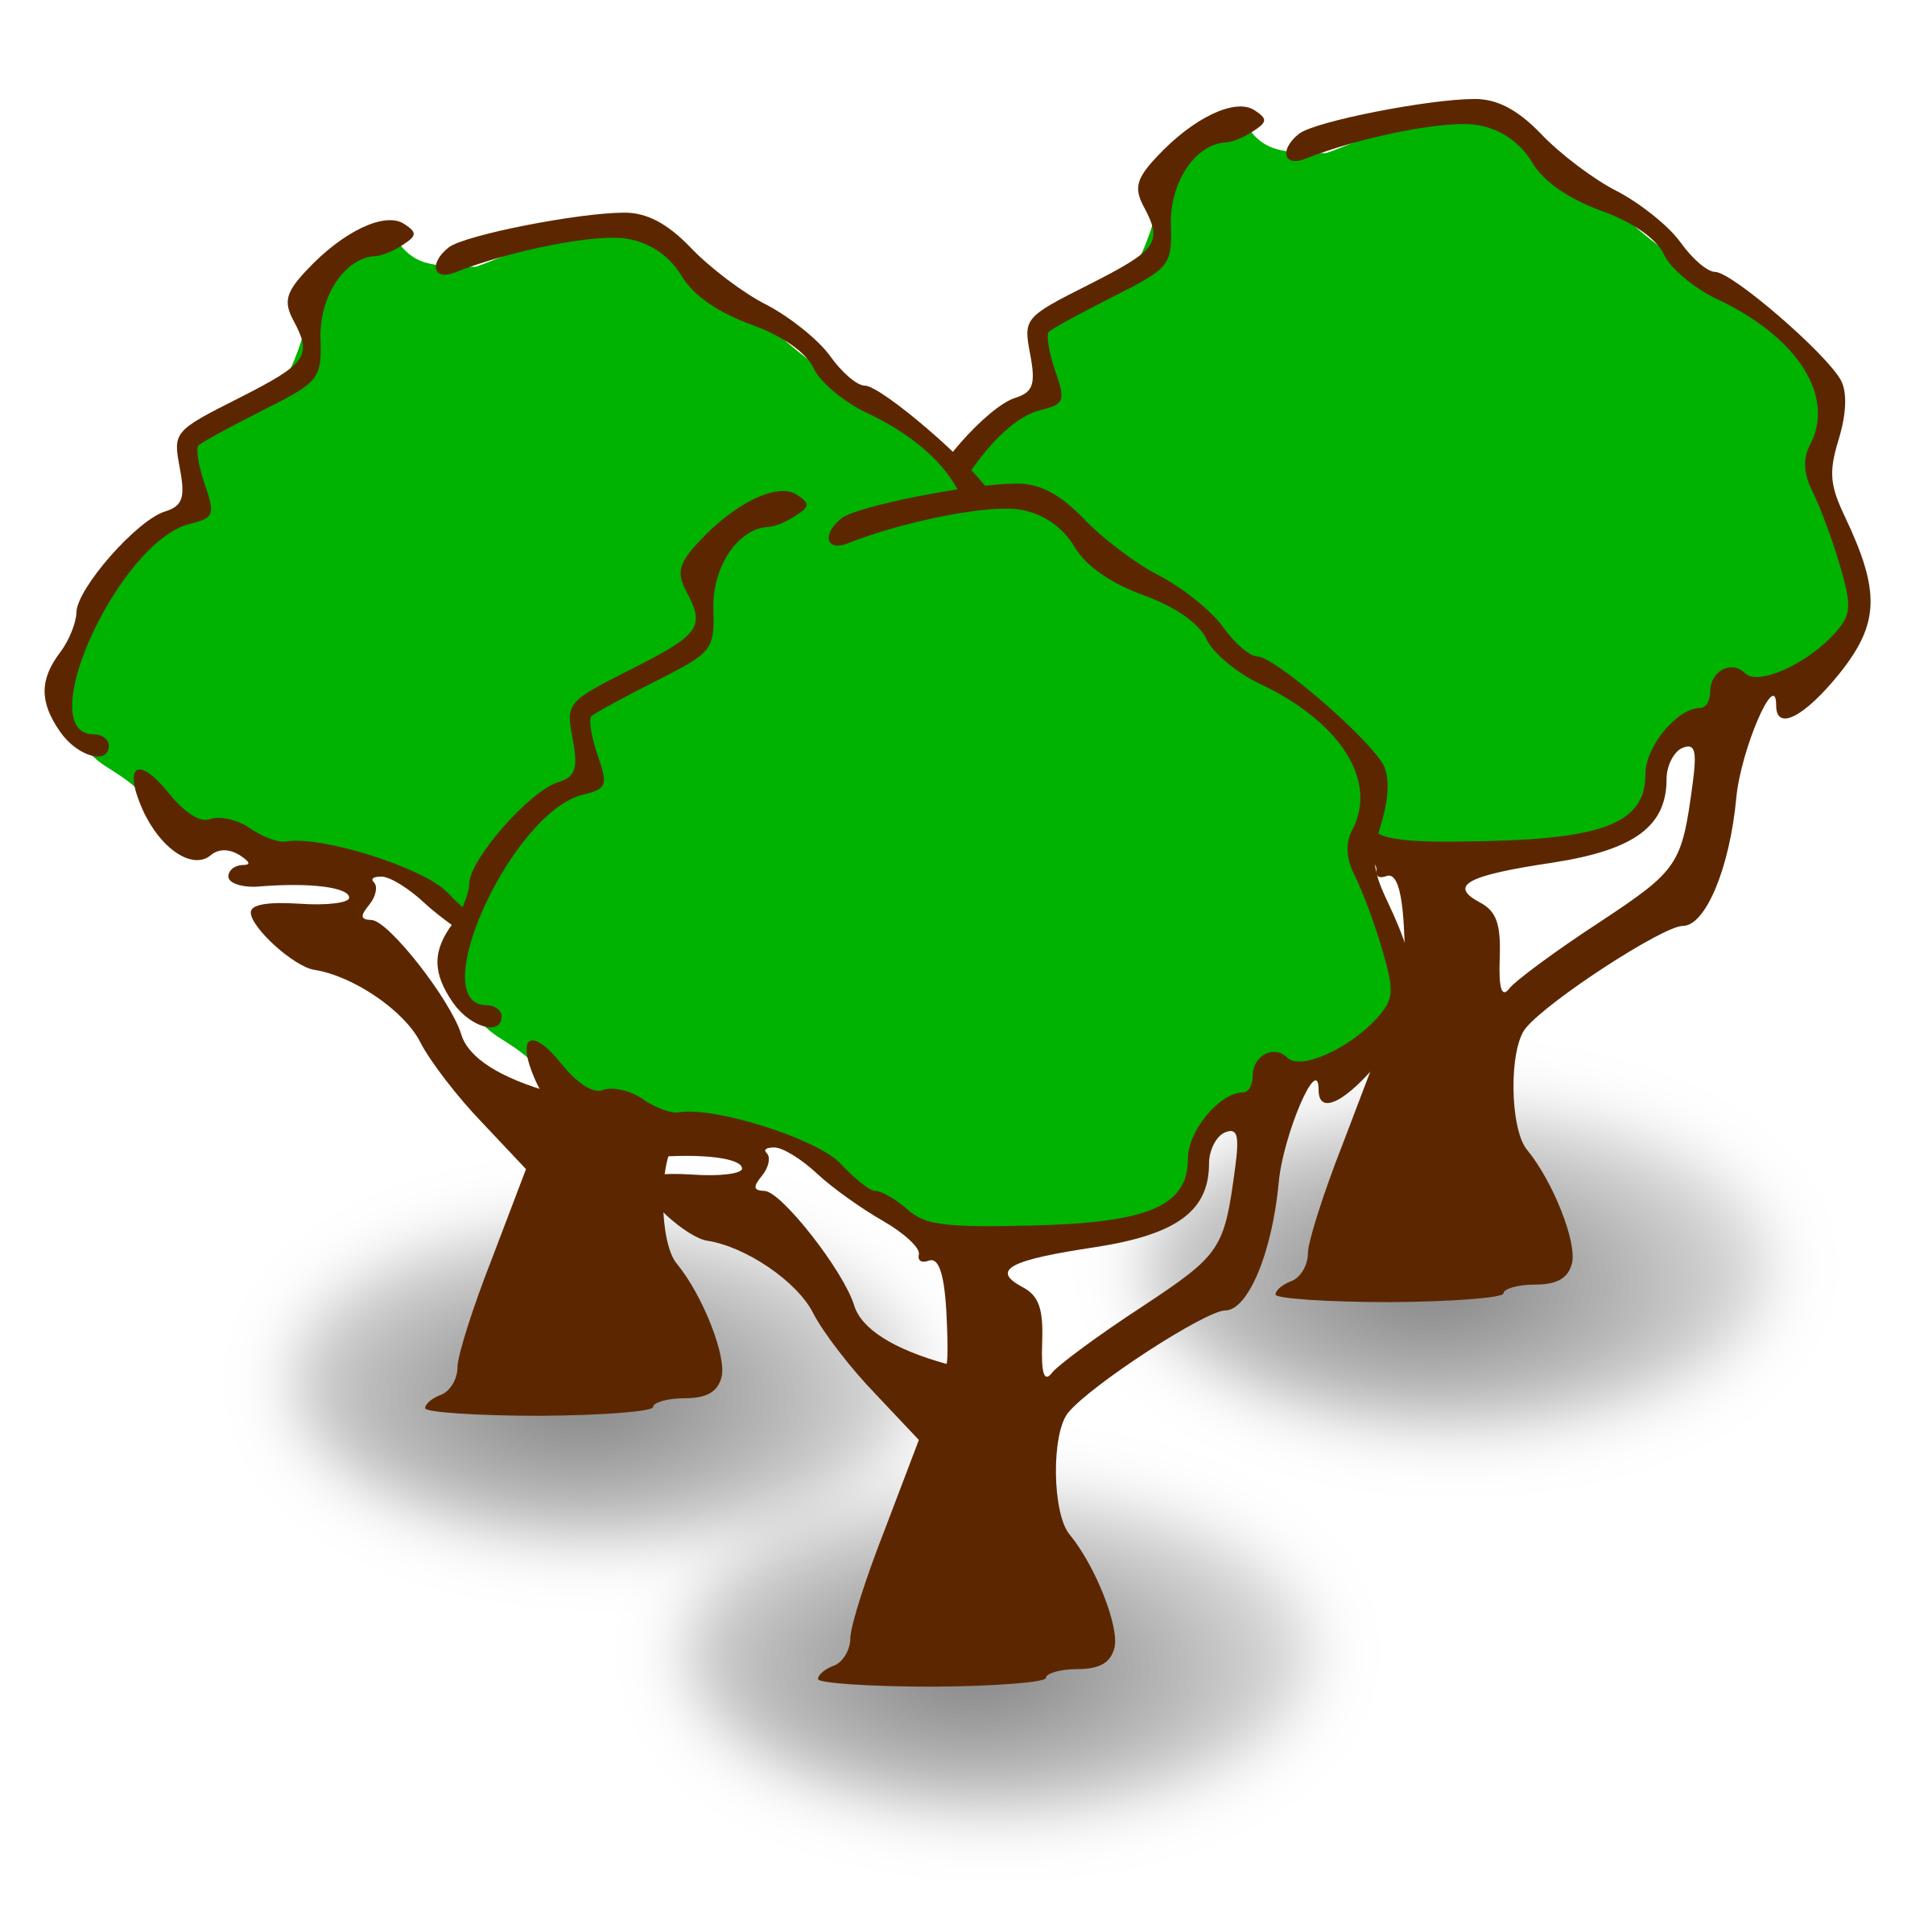 Bush clipart forest. Free clipartmansion com heafy